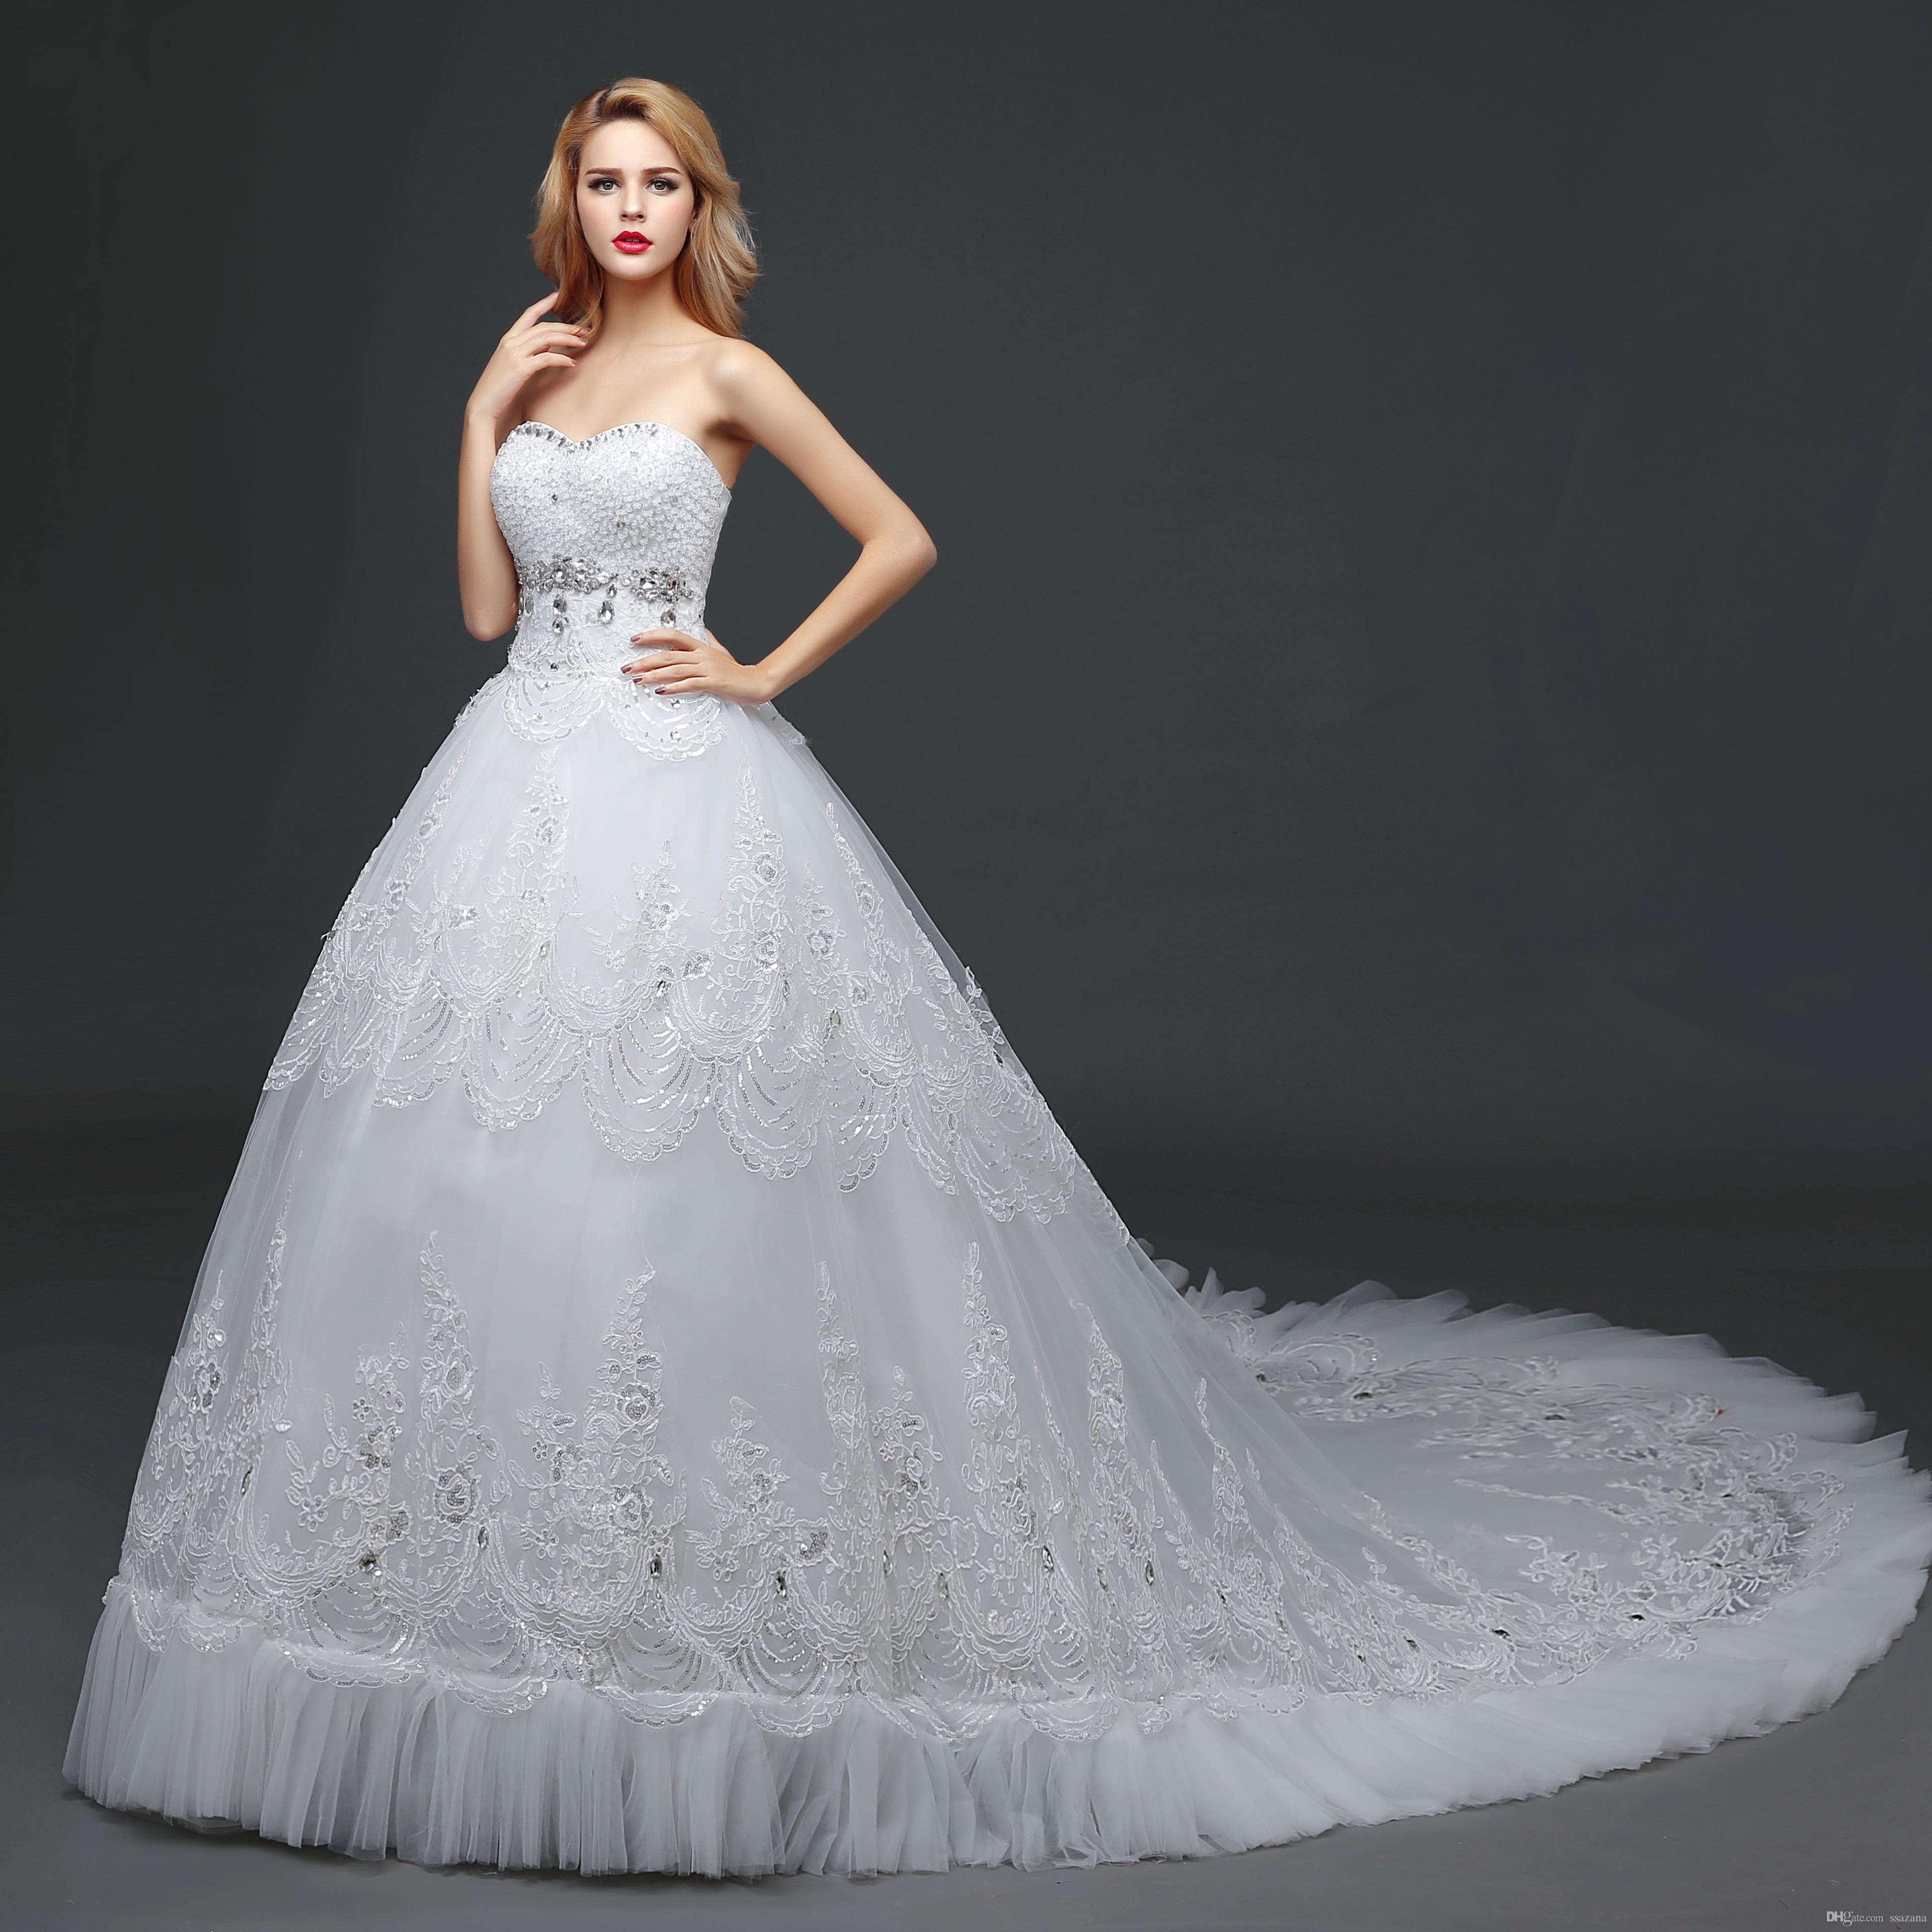 Long tail wedding dresses Beautiful crystal print sequins Mermaid wedding dress robes de soirée De Mariee Plus